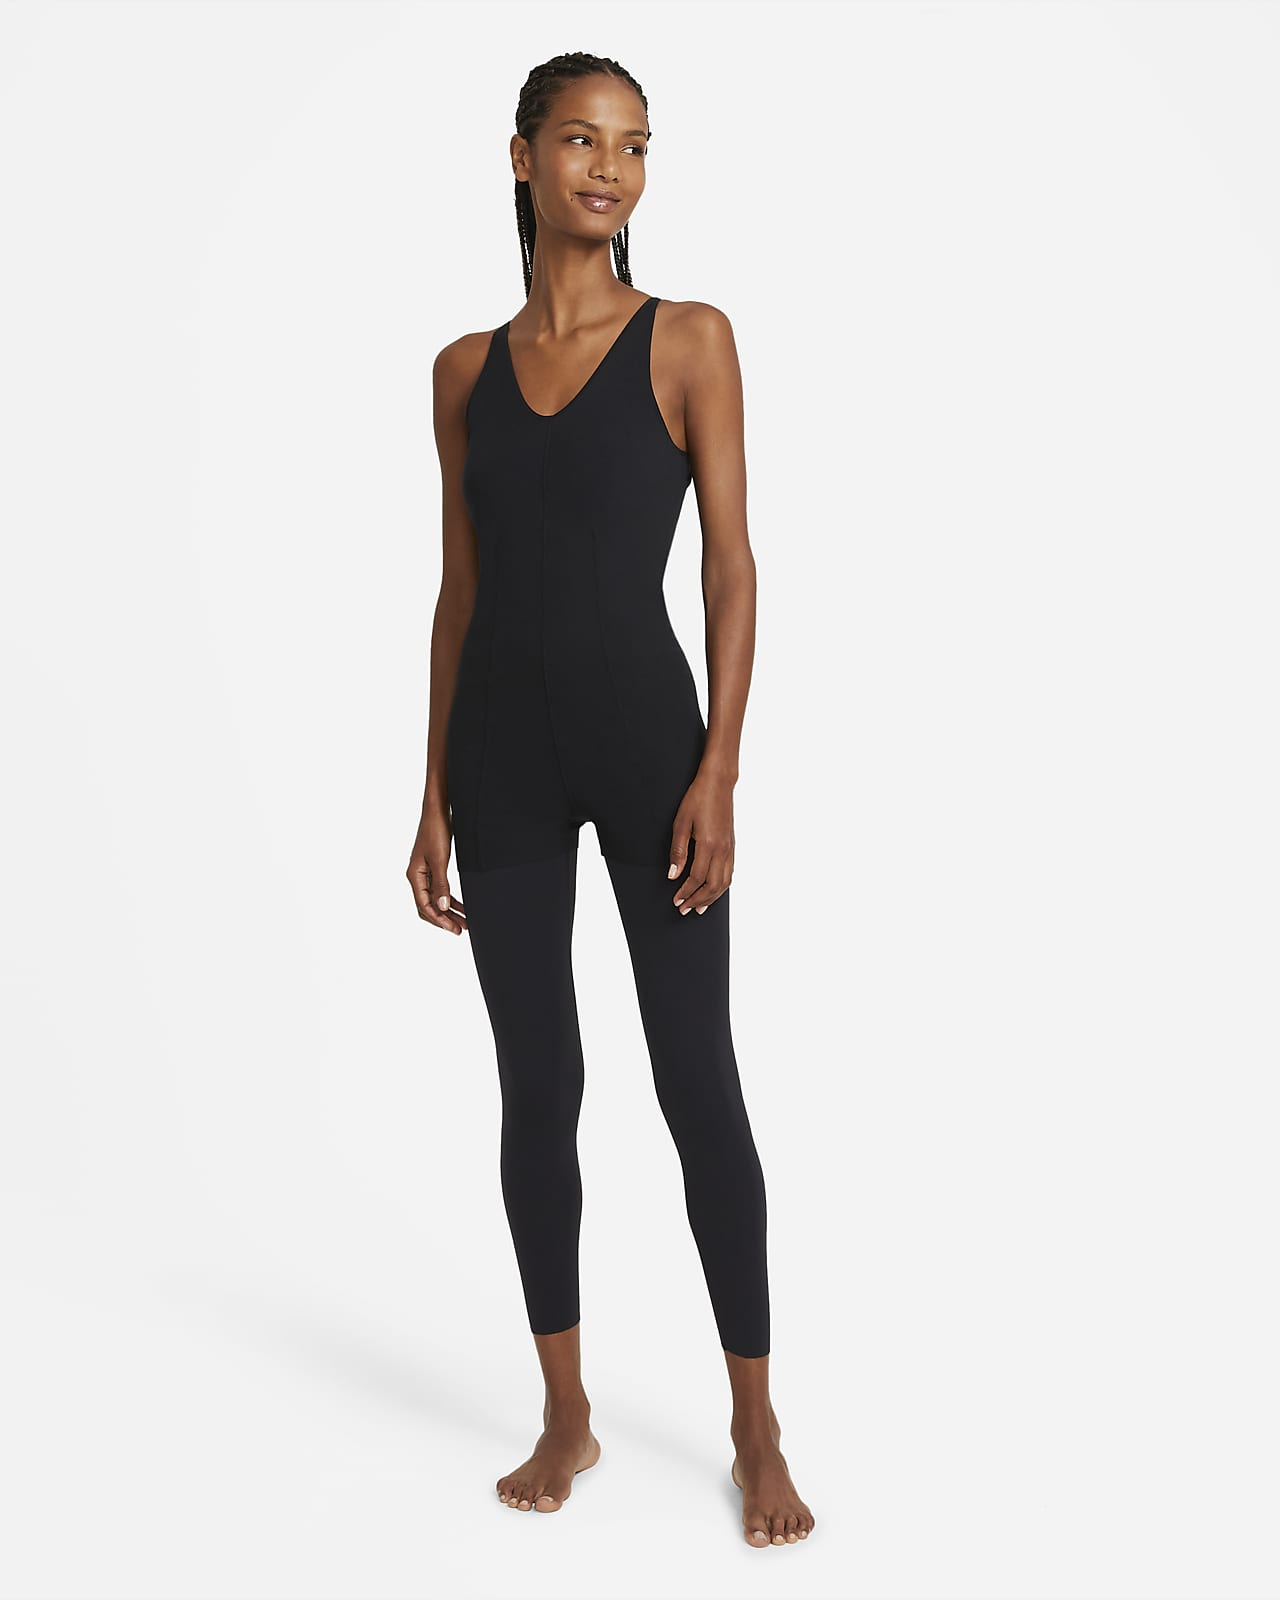 Nike Yoga Luxe-lagdelt 7/8-buksedragt til kvinder